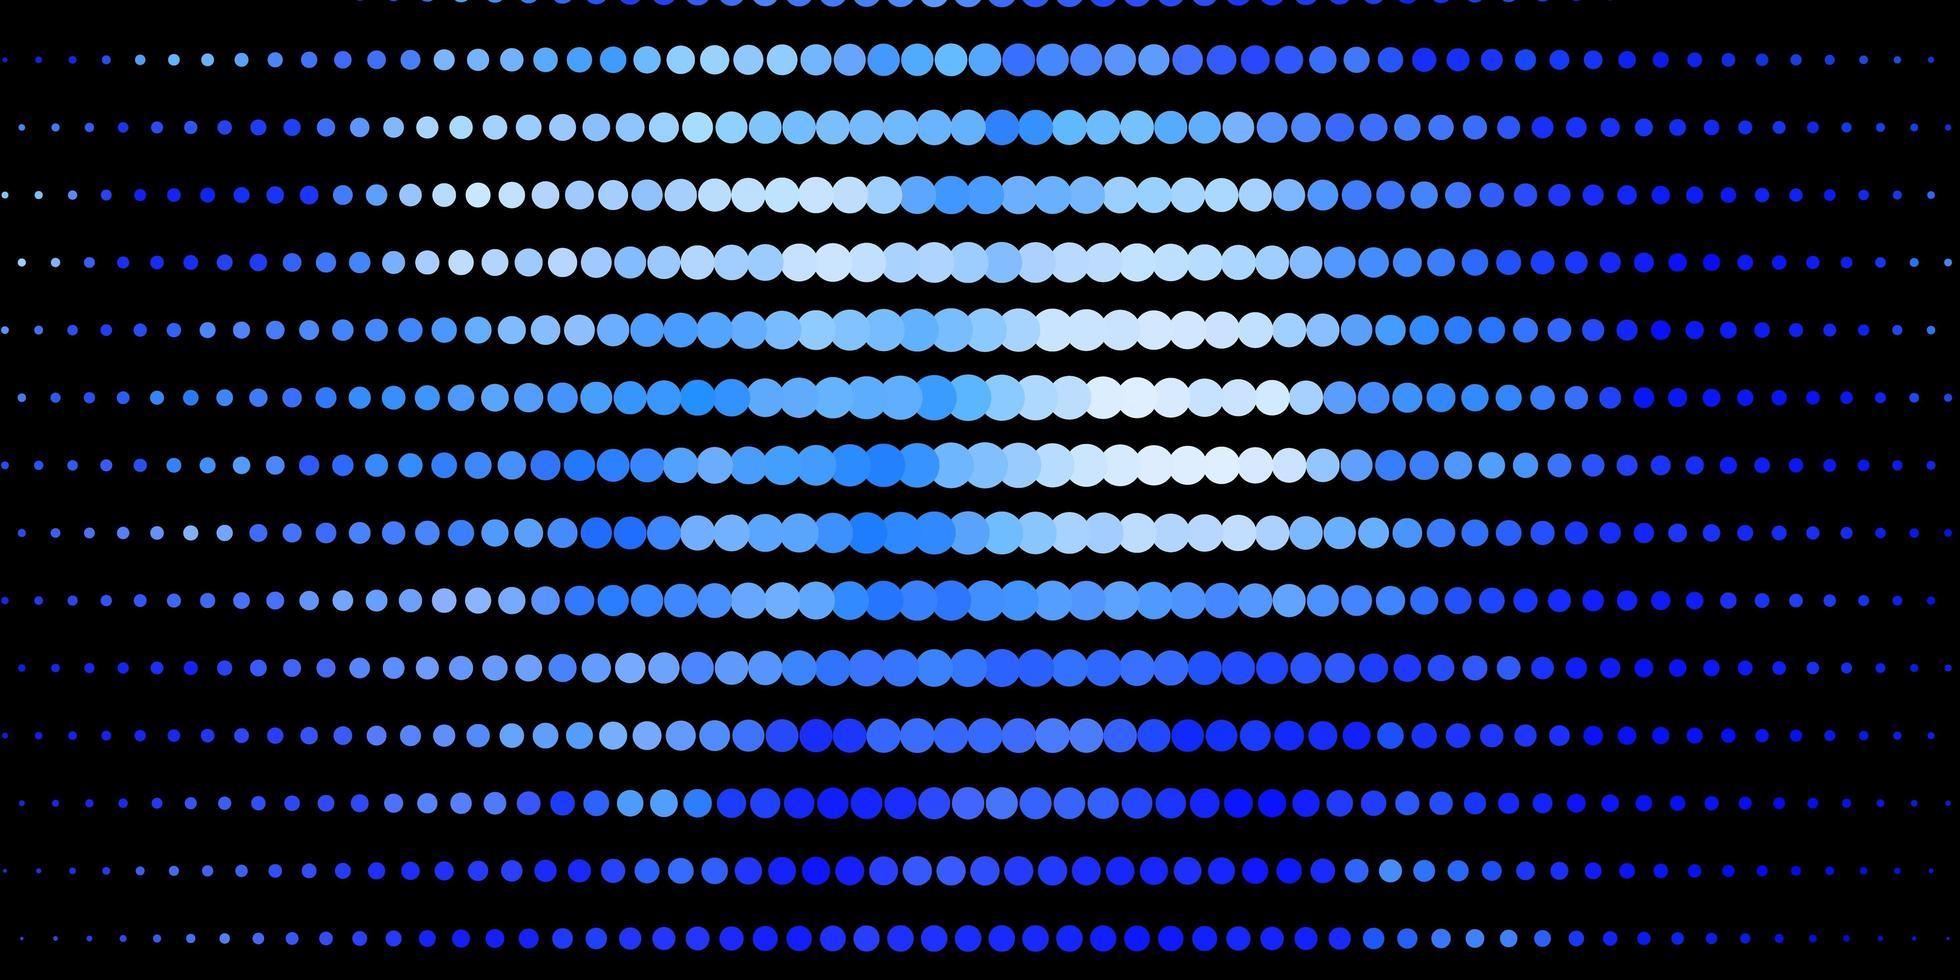 Dark BLUE vector backdrop with dots.